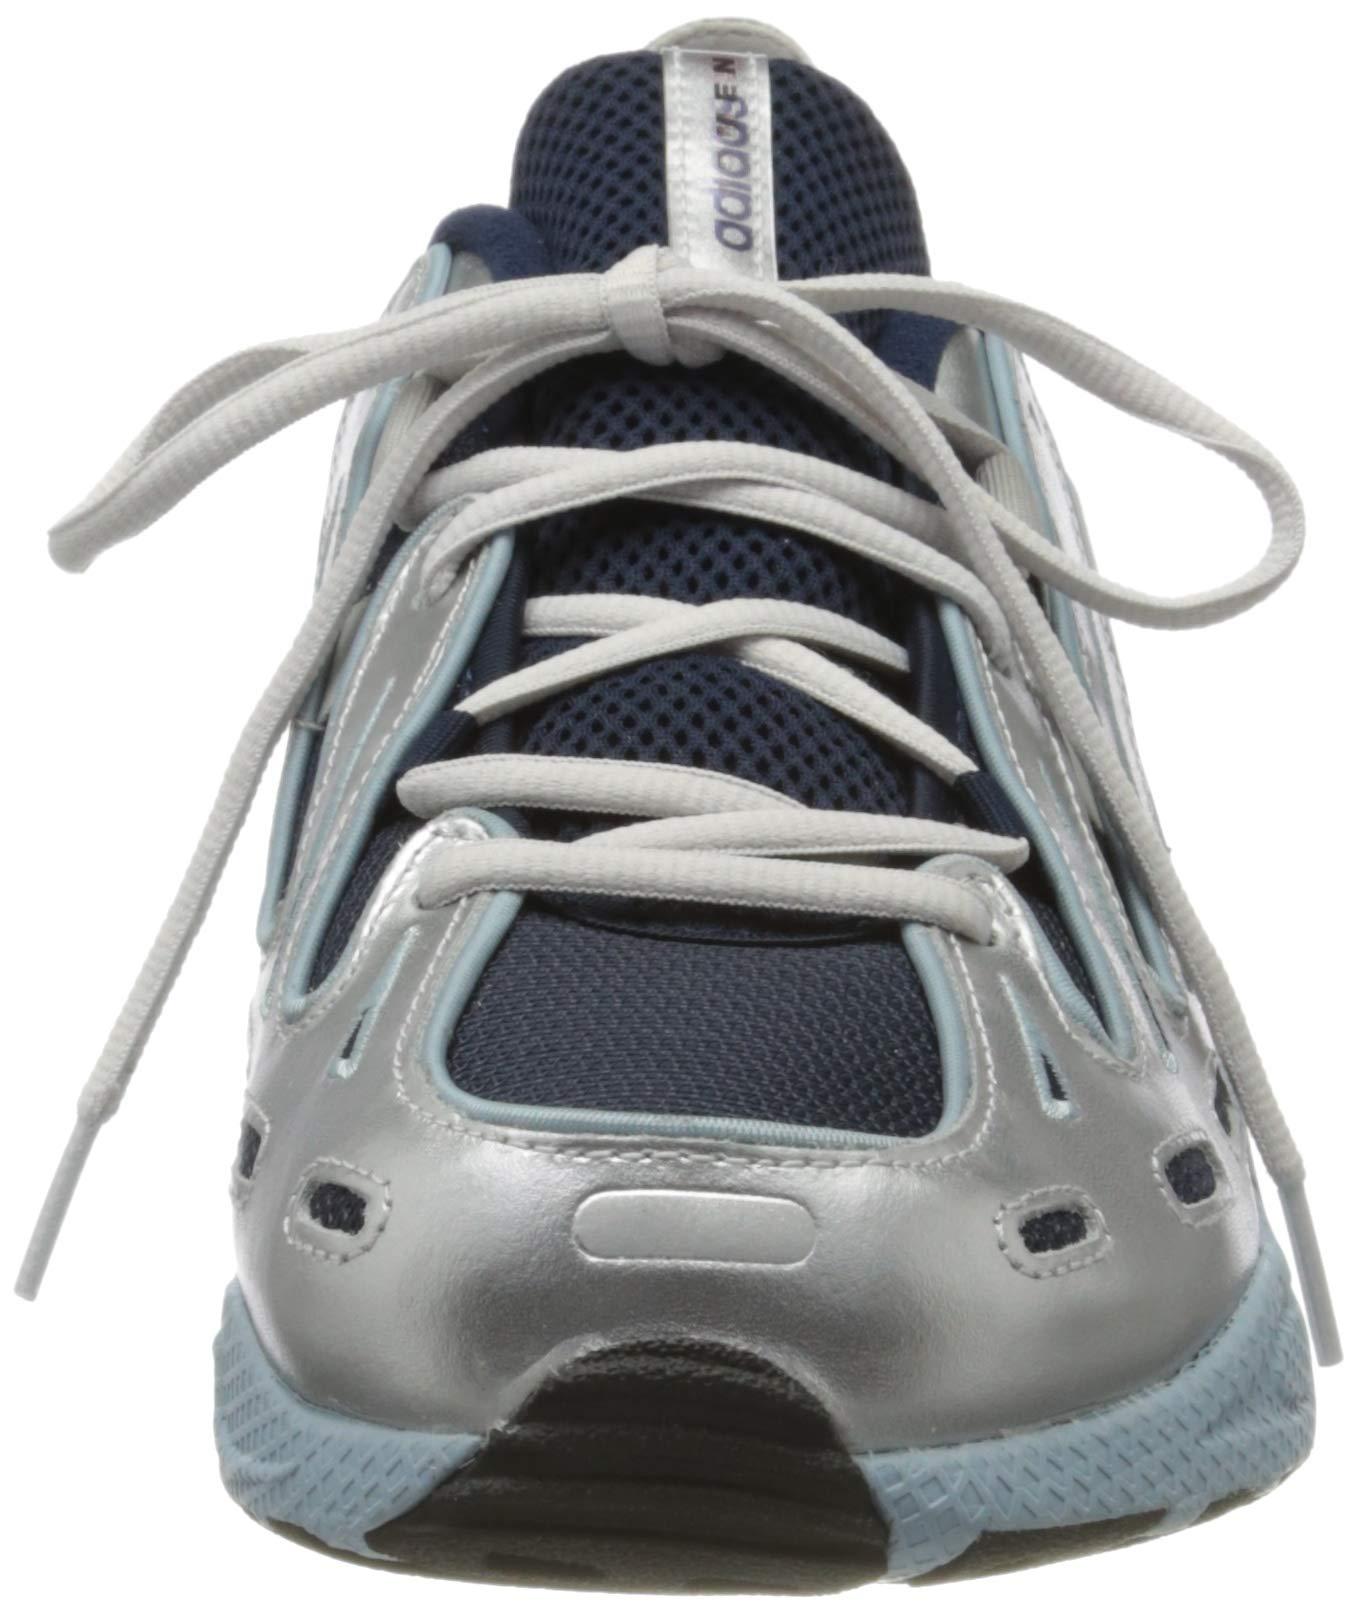 adidas EQT Gazelle, Scarpe da Ginnastica Uomo 4 spesavip